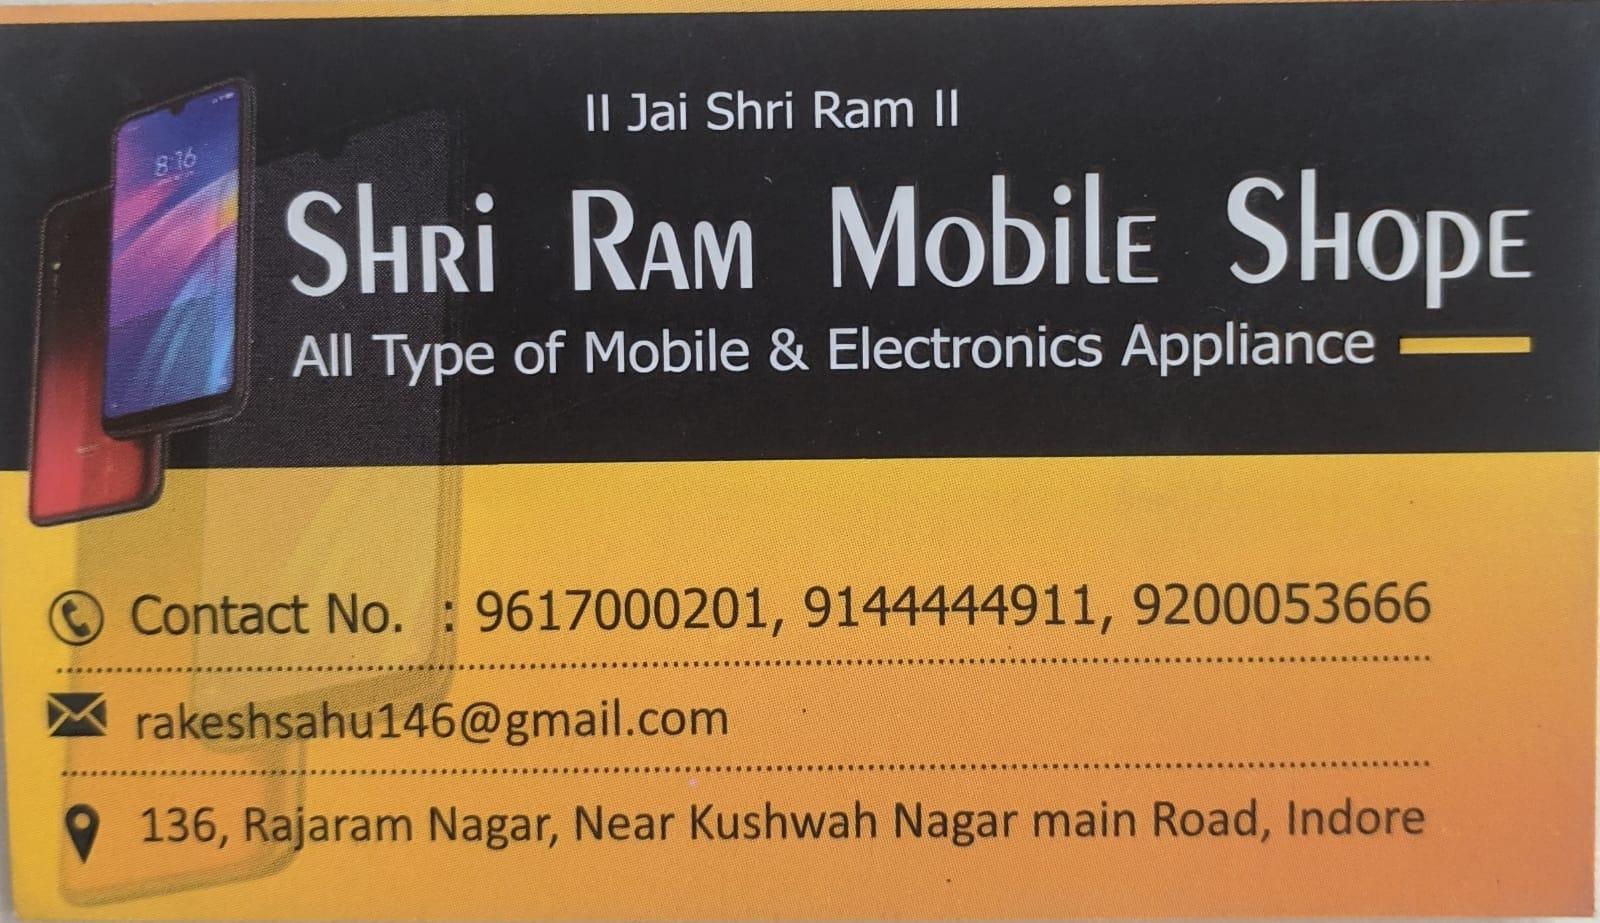 Shri Ram Mobile Shop